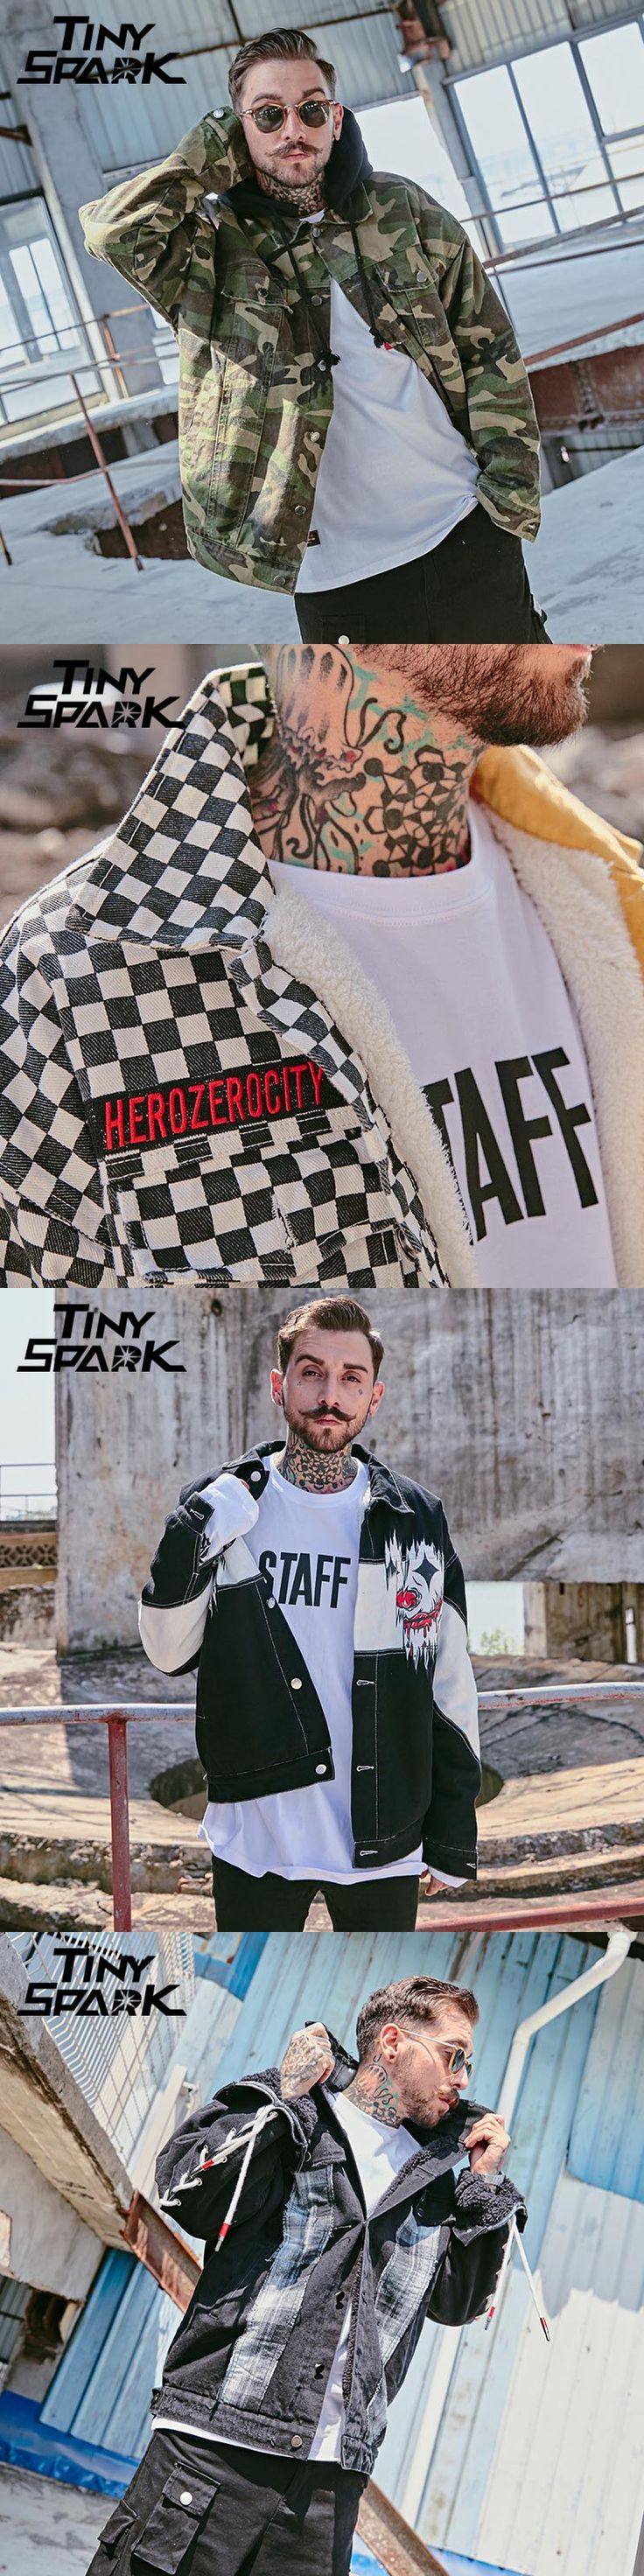 Tiny Spark 2017 Winter Bomber Jacket Men Black White Patchwork Grey Clown Denim Jacket Men Short Pilot Bomber Jacket Coat Cotton Warm Twill